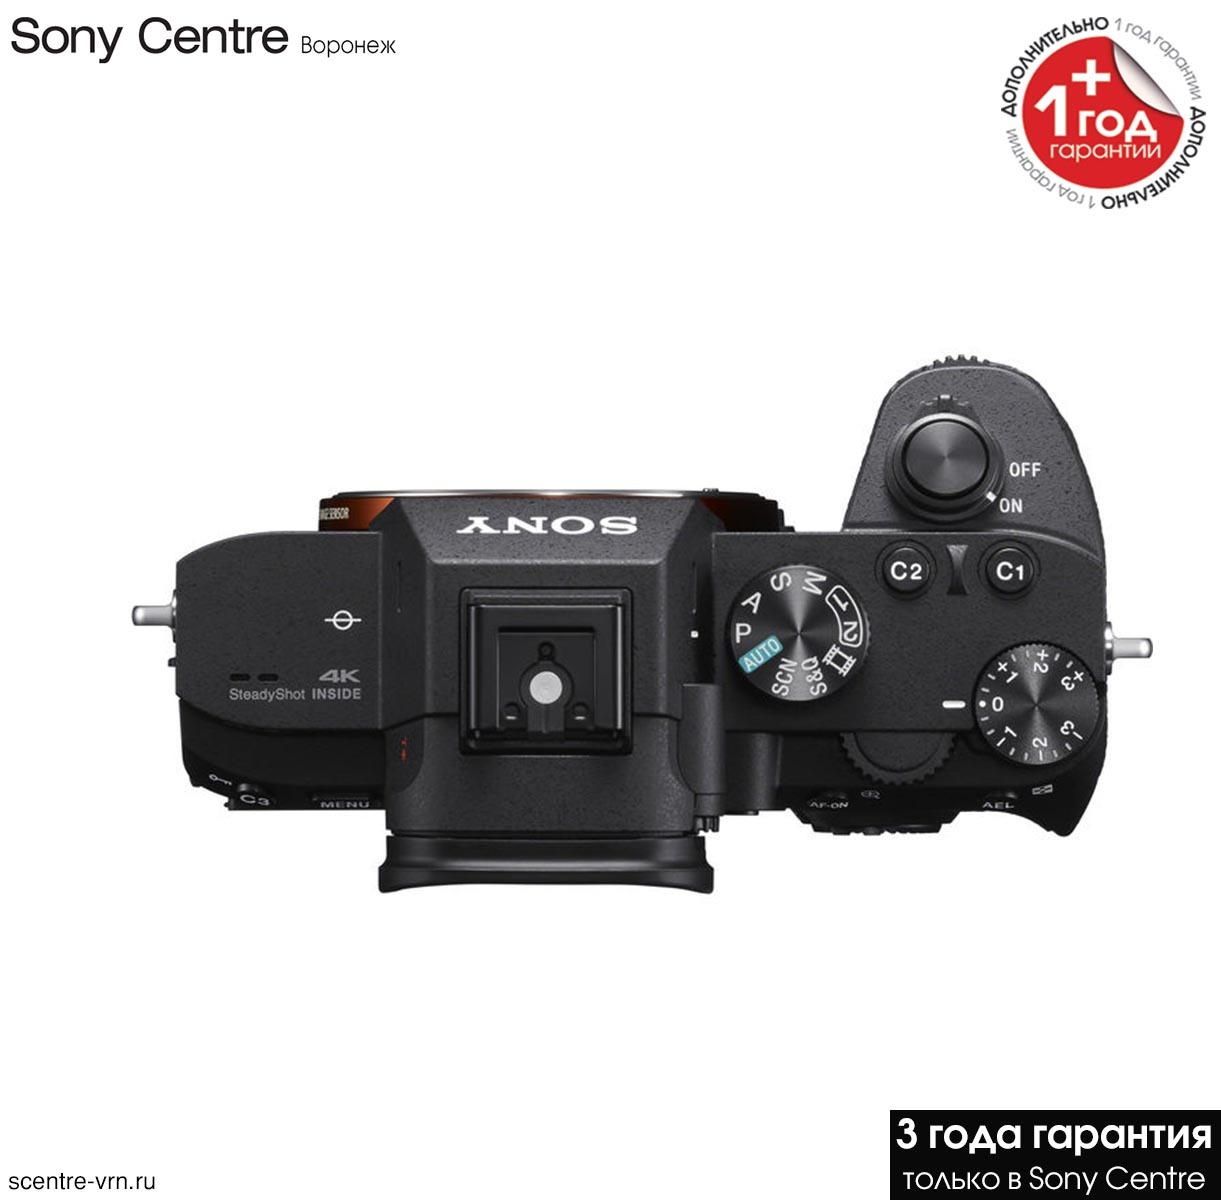 Полнокадровая камера Sony A7 III без объектива в фирменном магазине